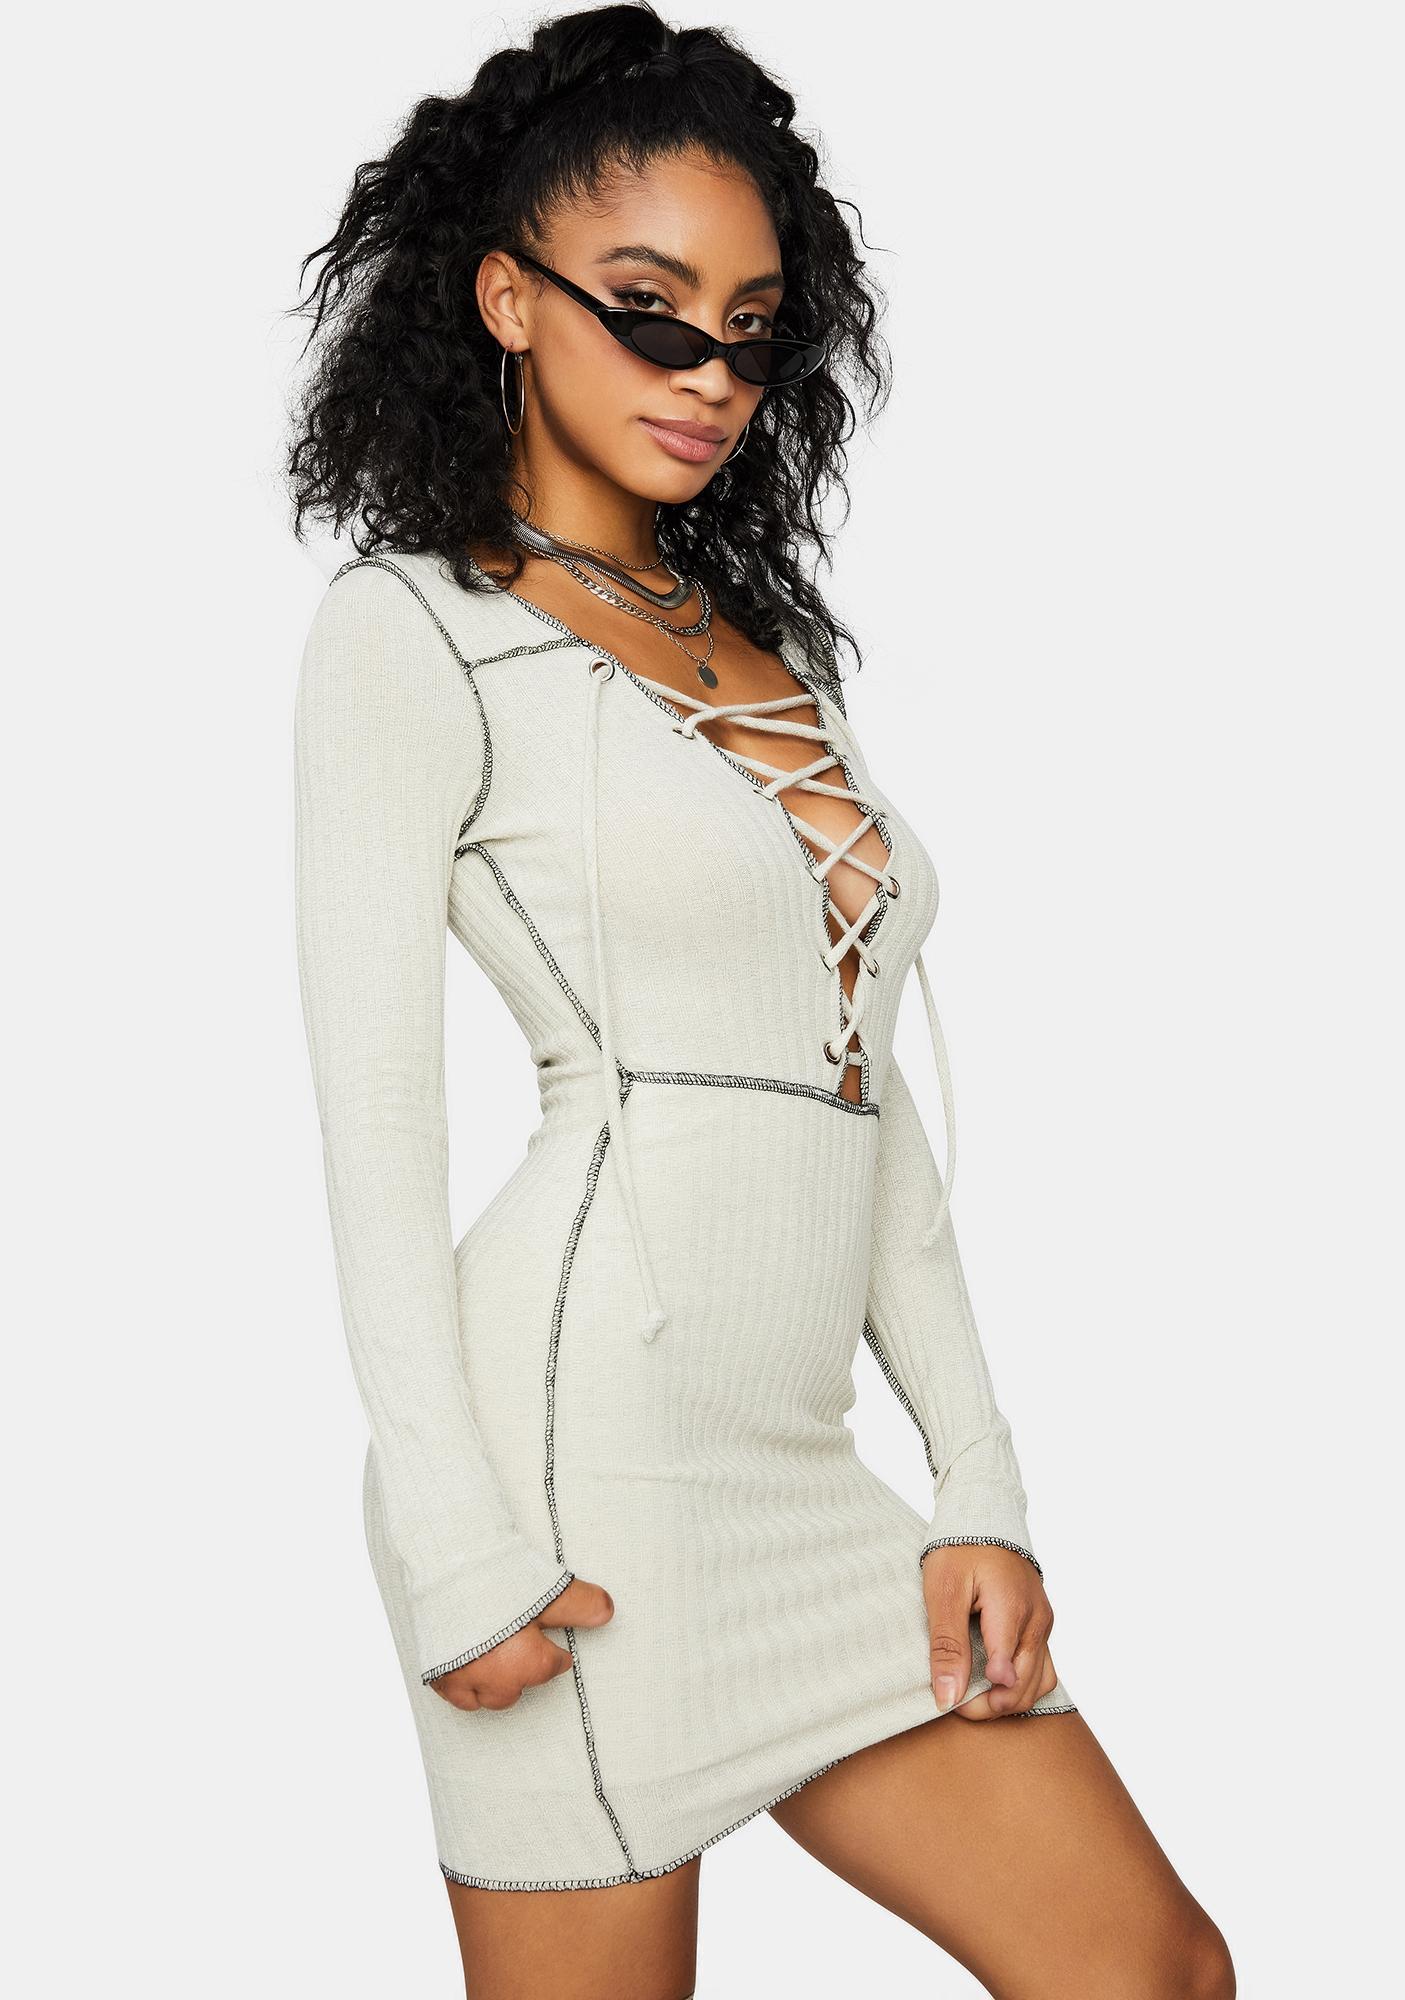 Ivory Catch Me Slippin' Lace Up Mini Dress